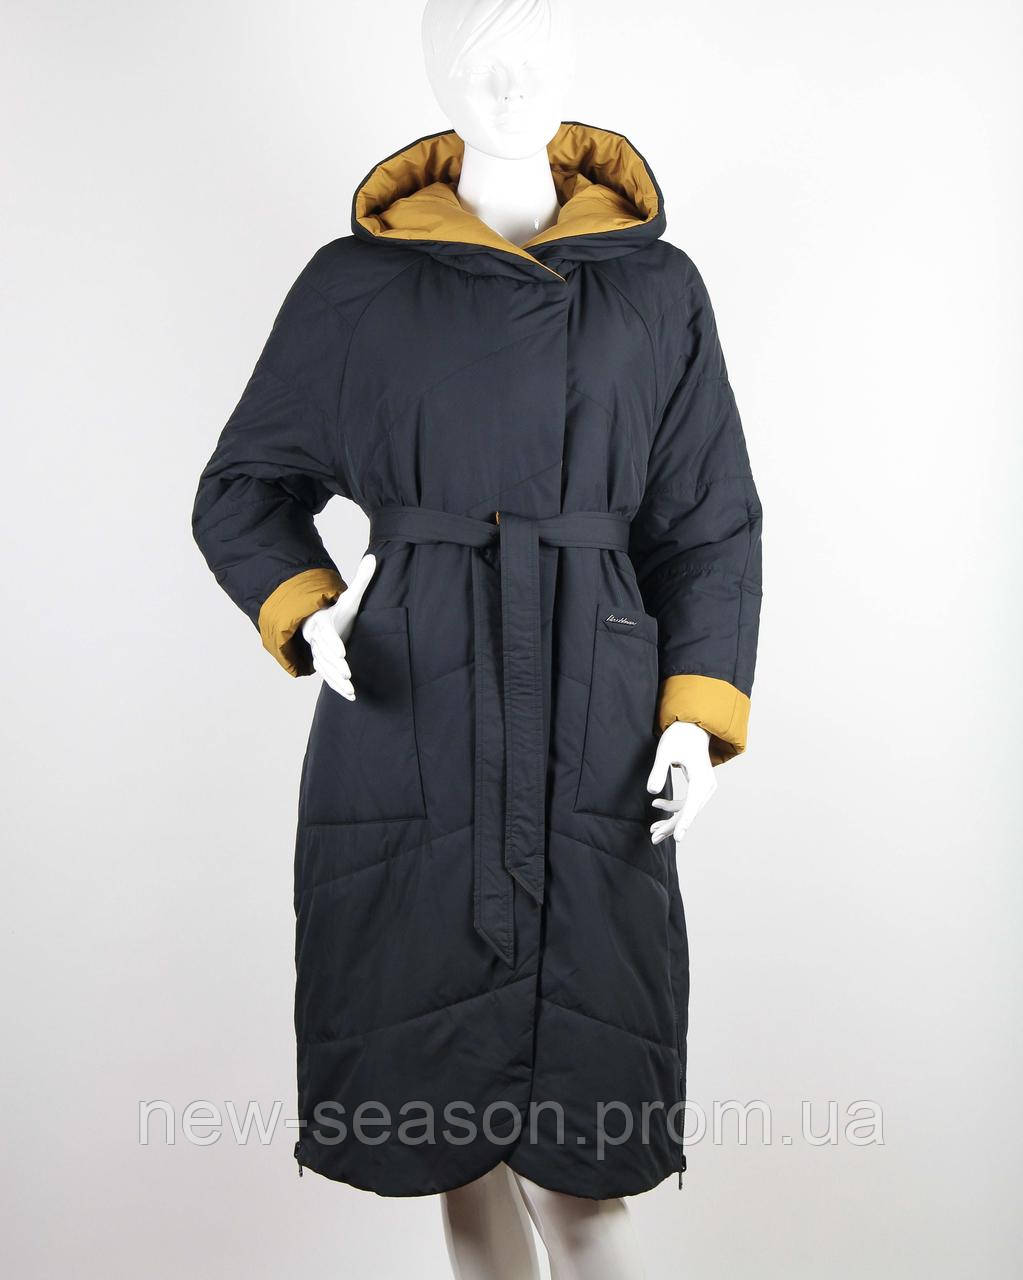 Пальто демисезонное двухстороннее Button J106-501-L